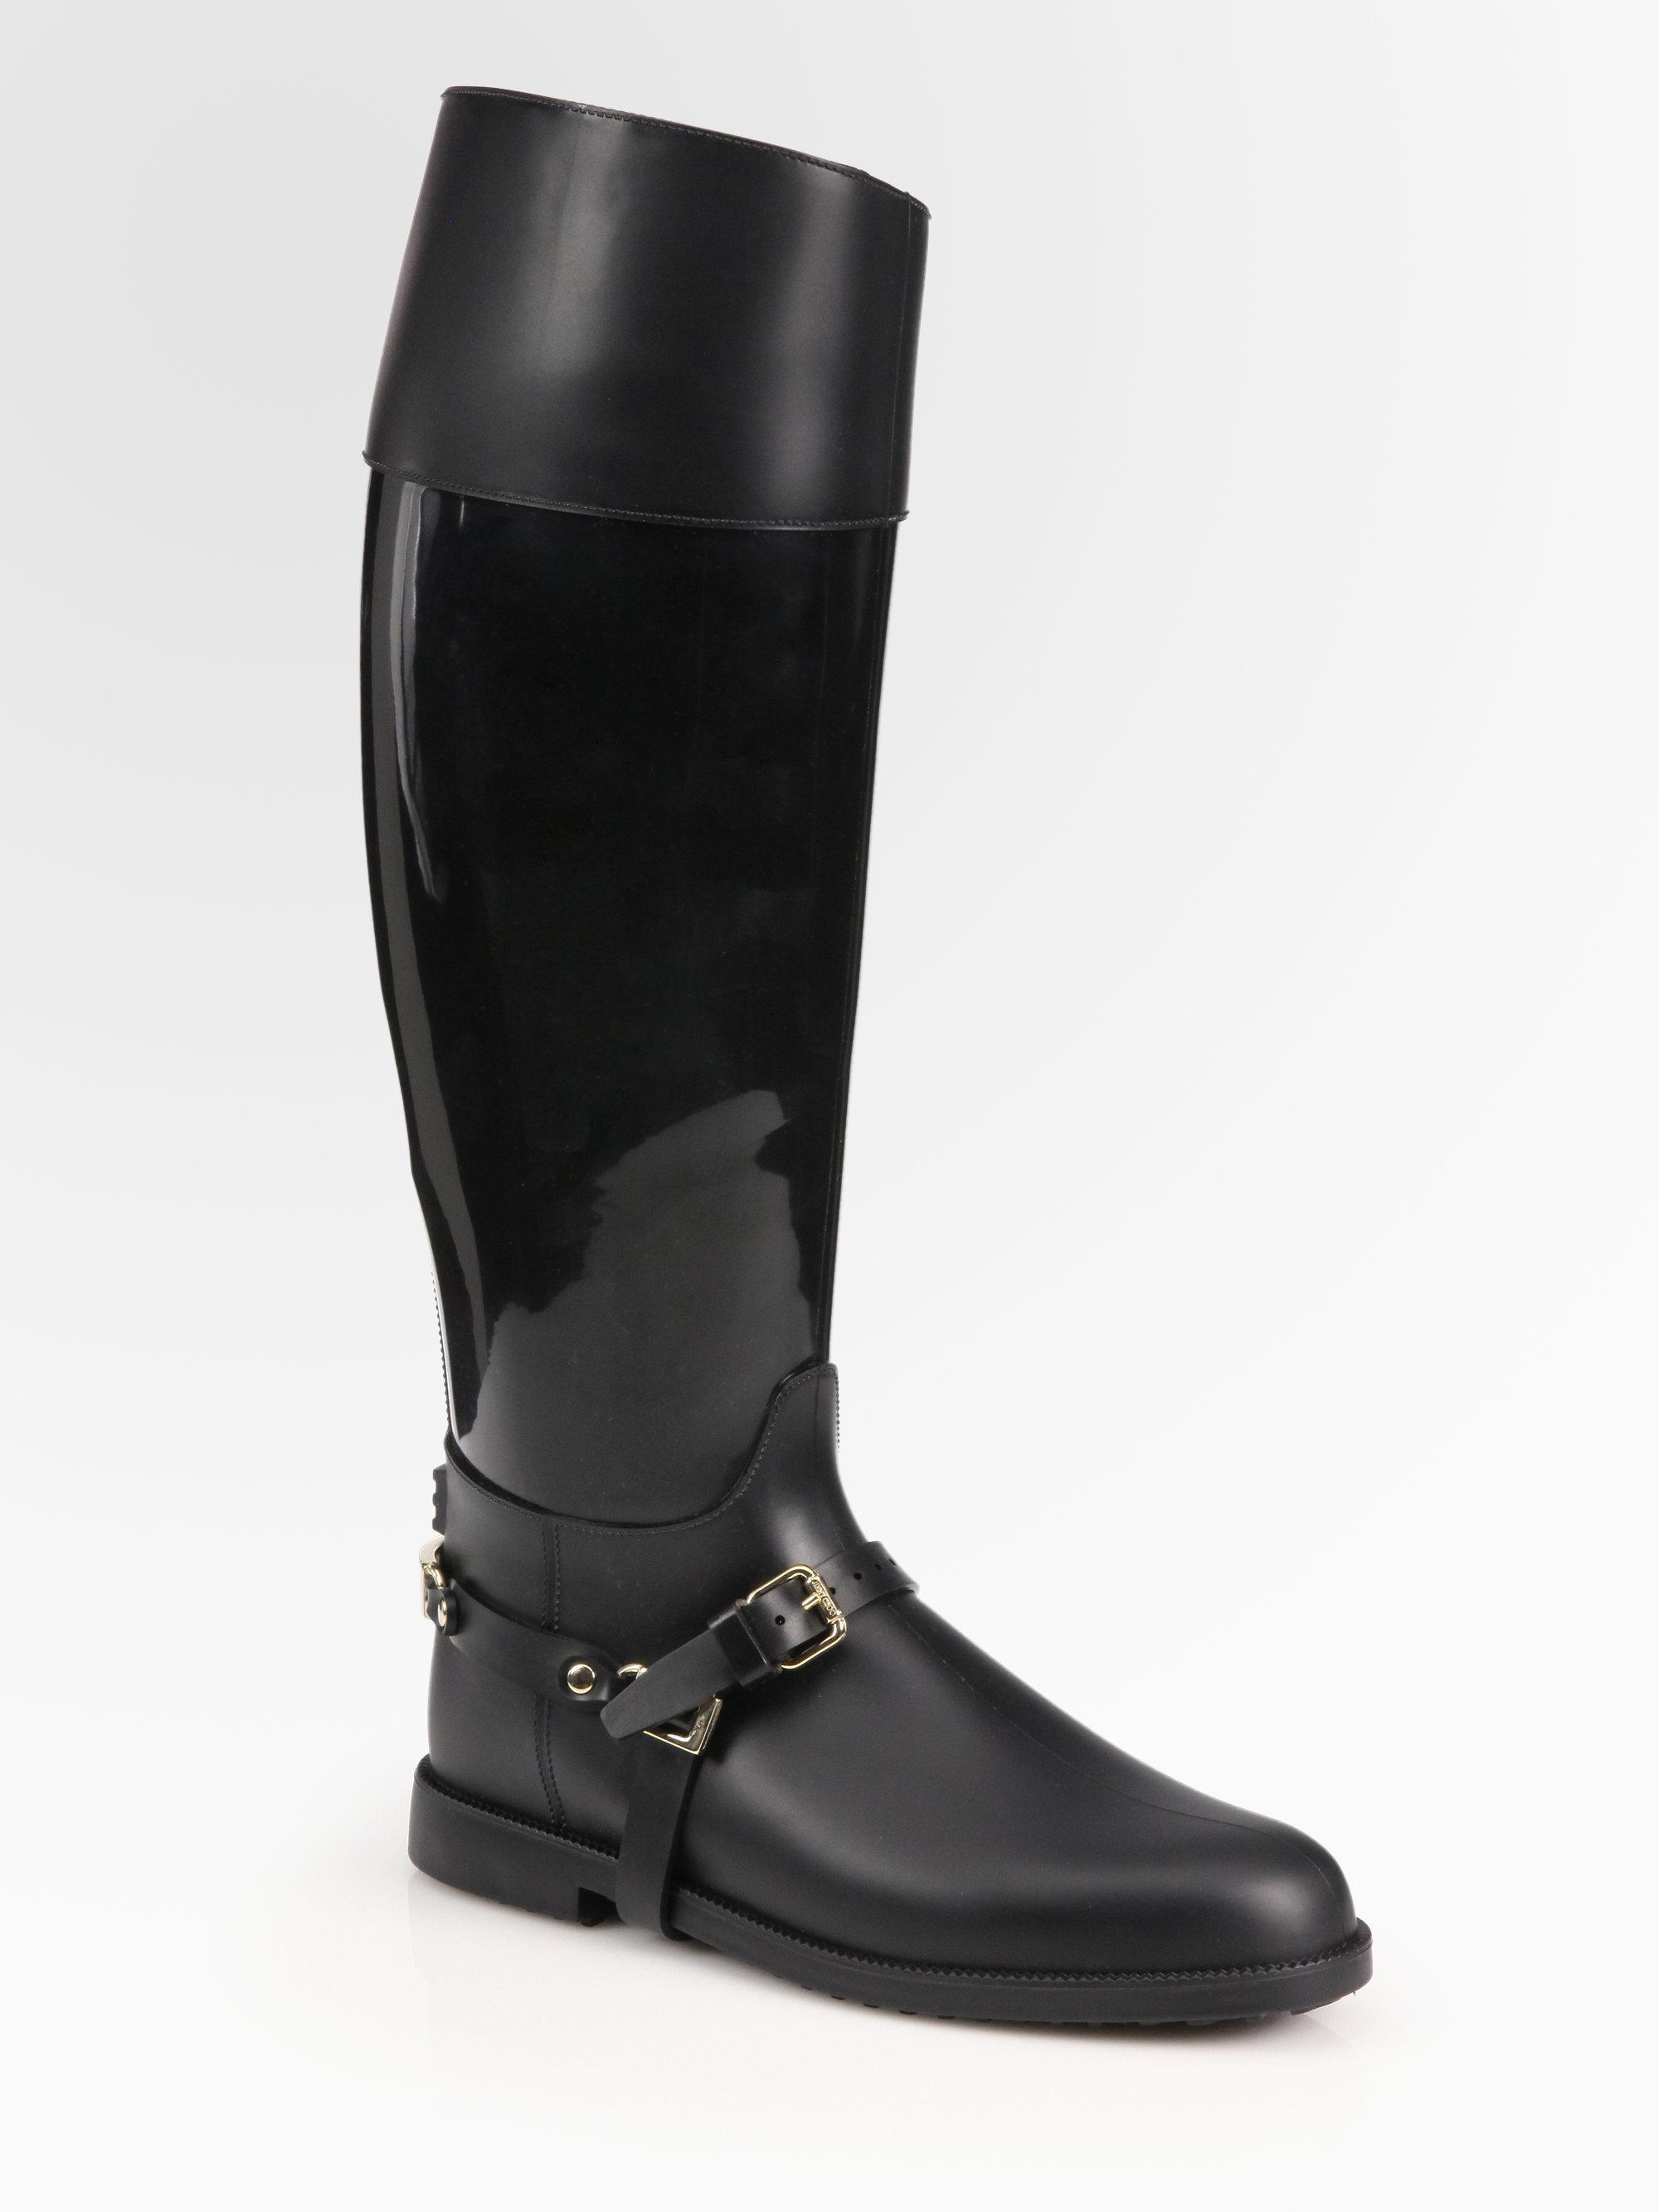 56525a68d34 Hunter Jimmy Choo Rain Boots Saks